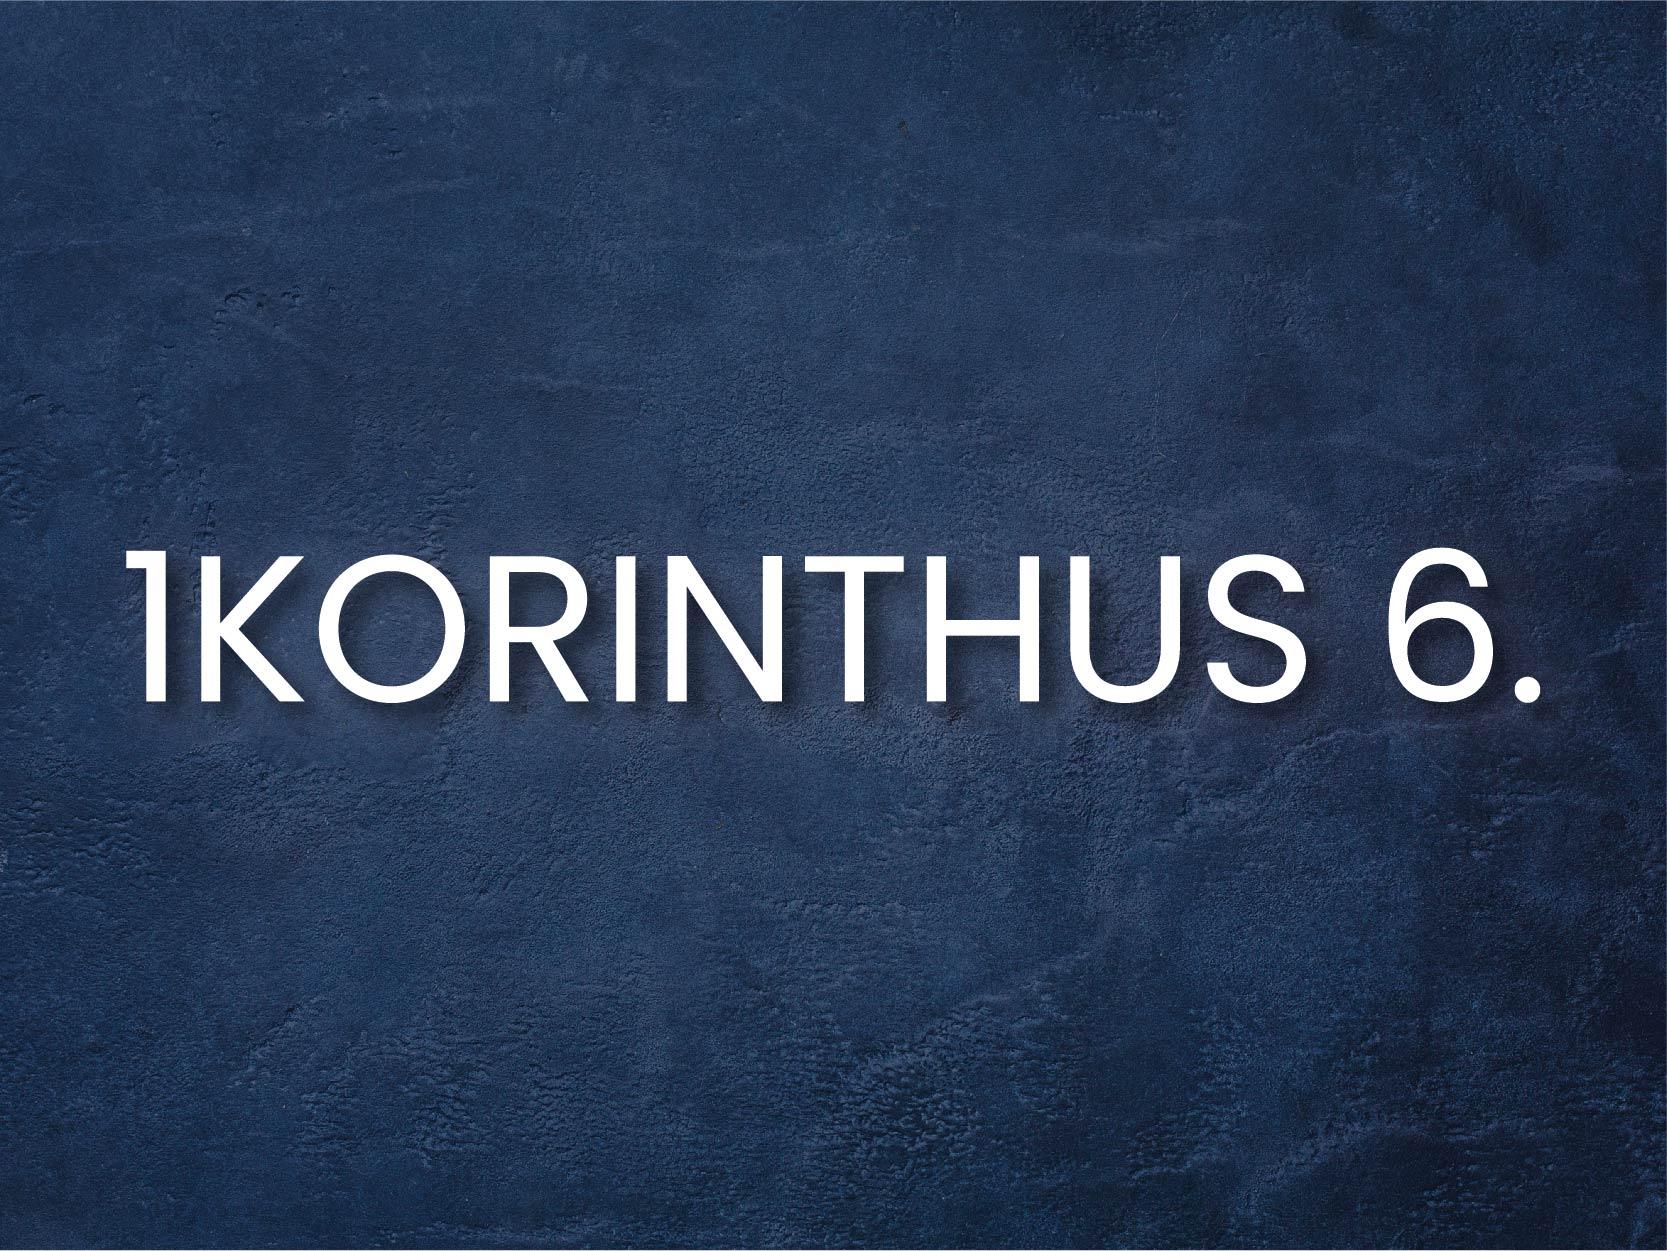 INFO_korinthus_6